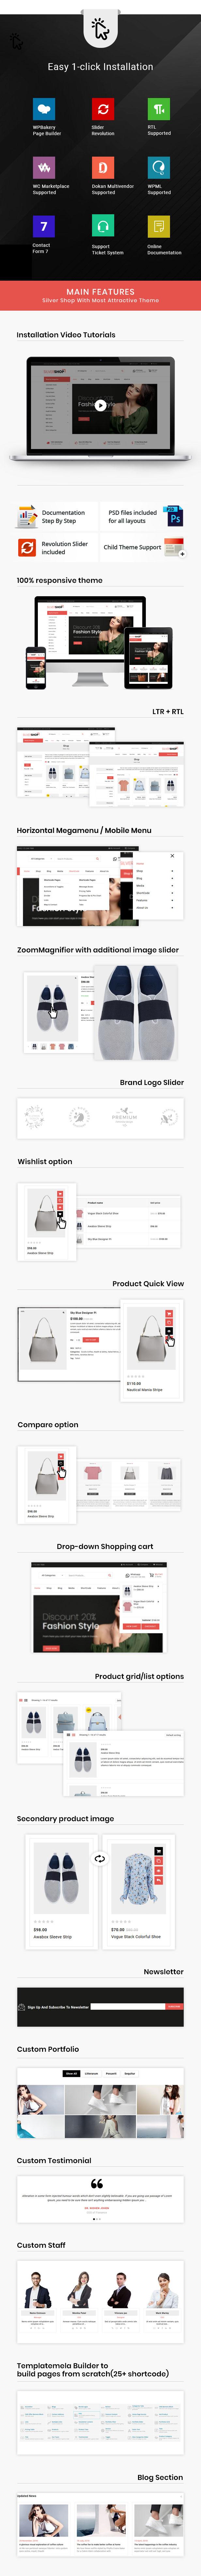 Silver Shop - Multipurpose WooCommerce Theme 8